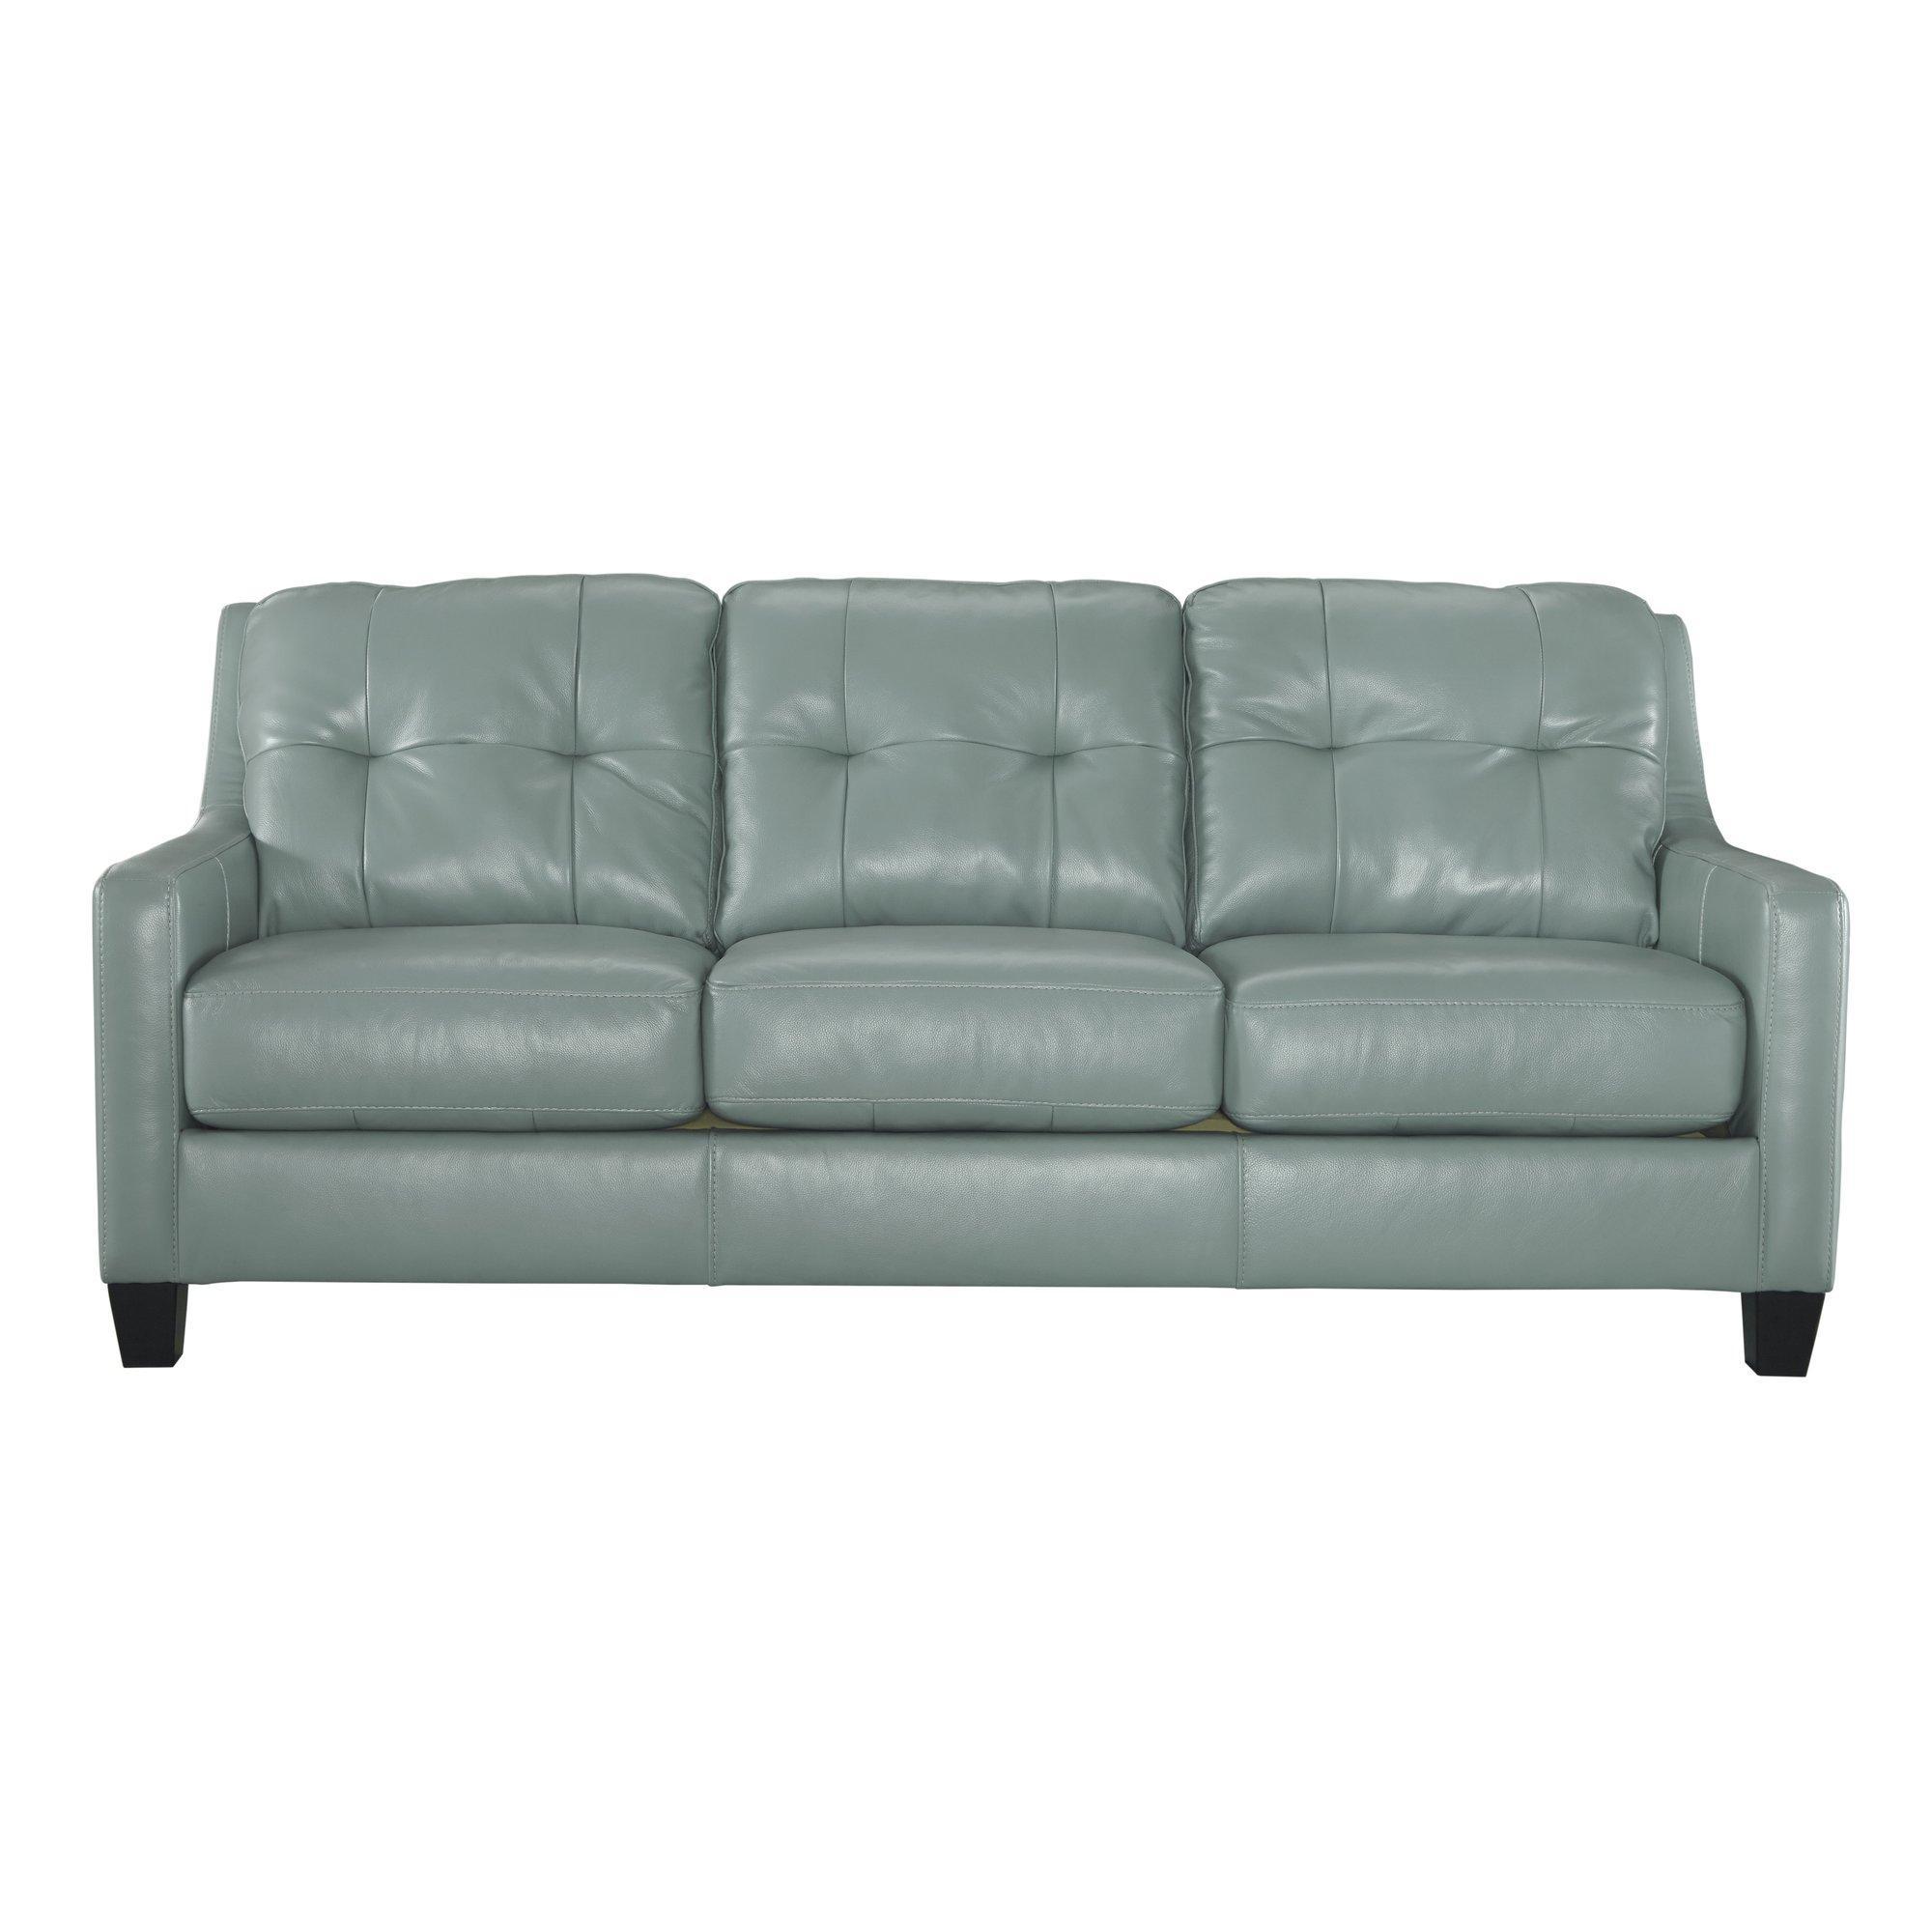 20 Ideas of Long Modern Sofas  Sofa Ideas